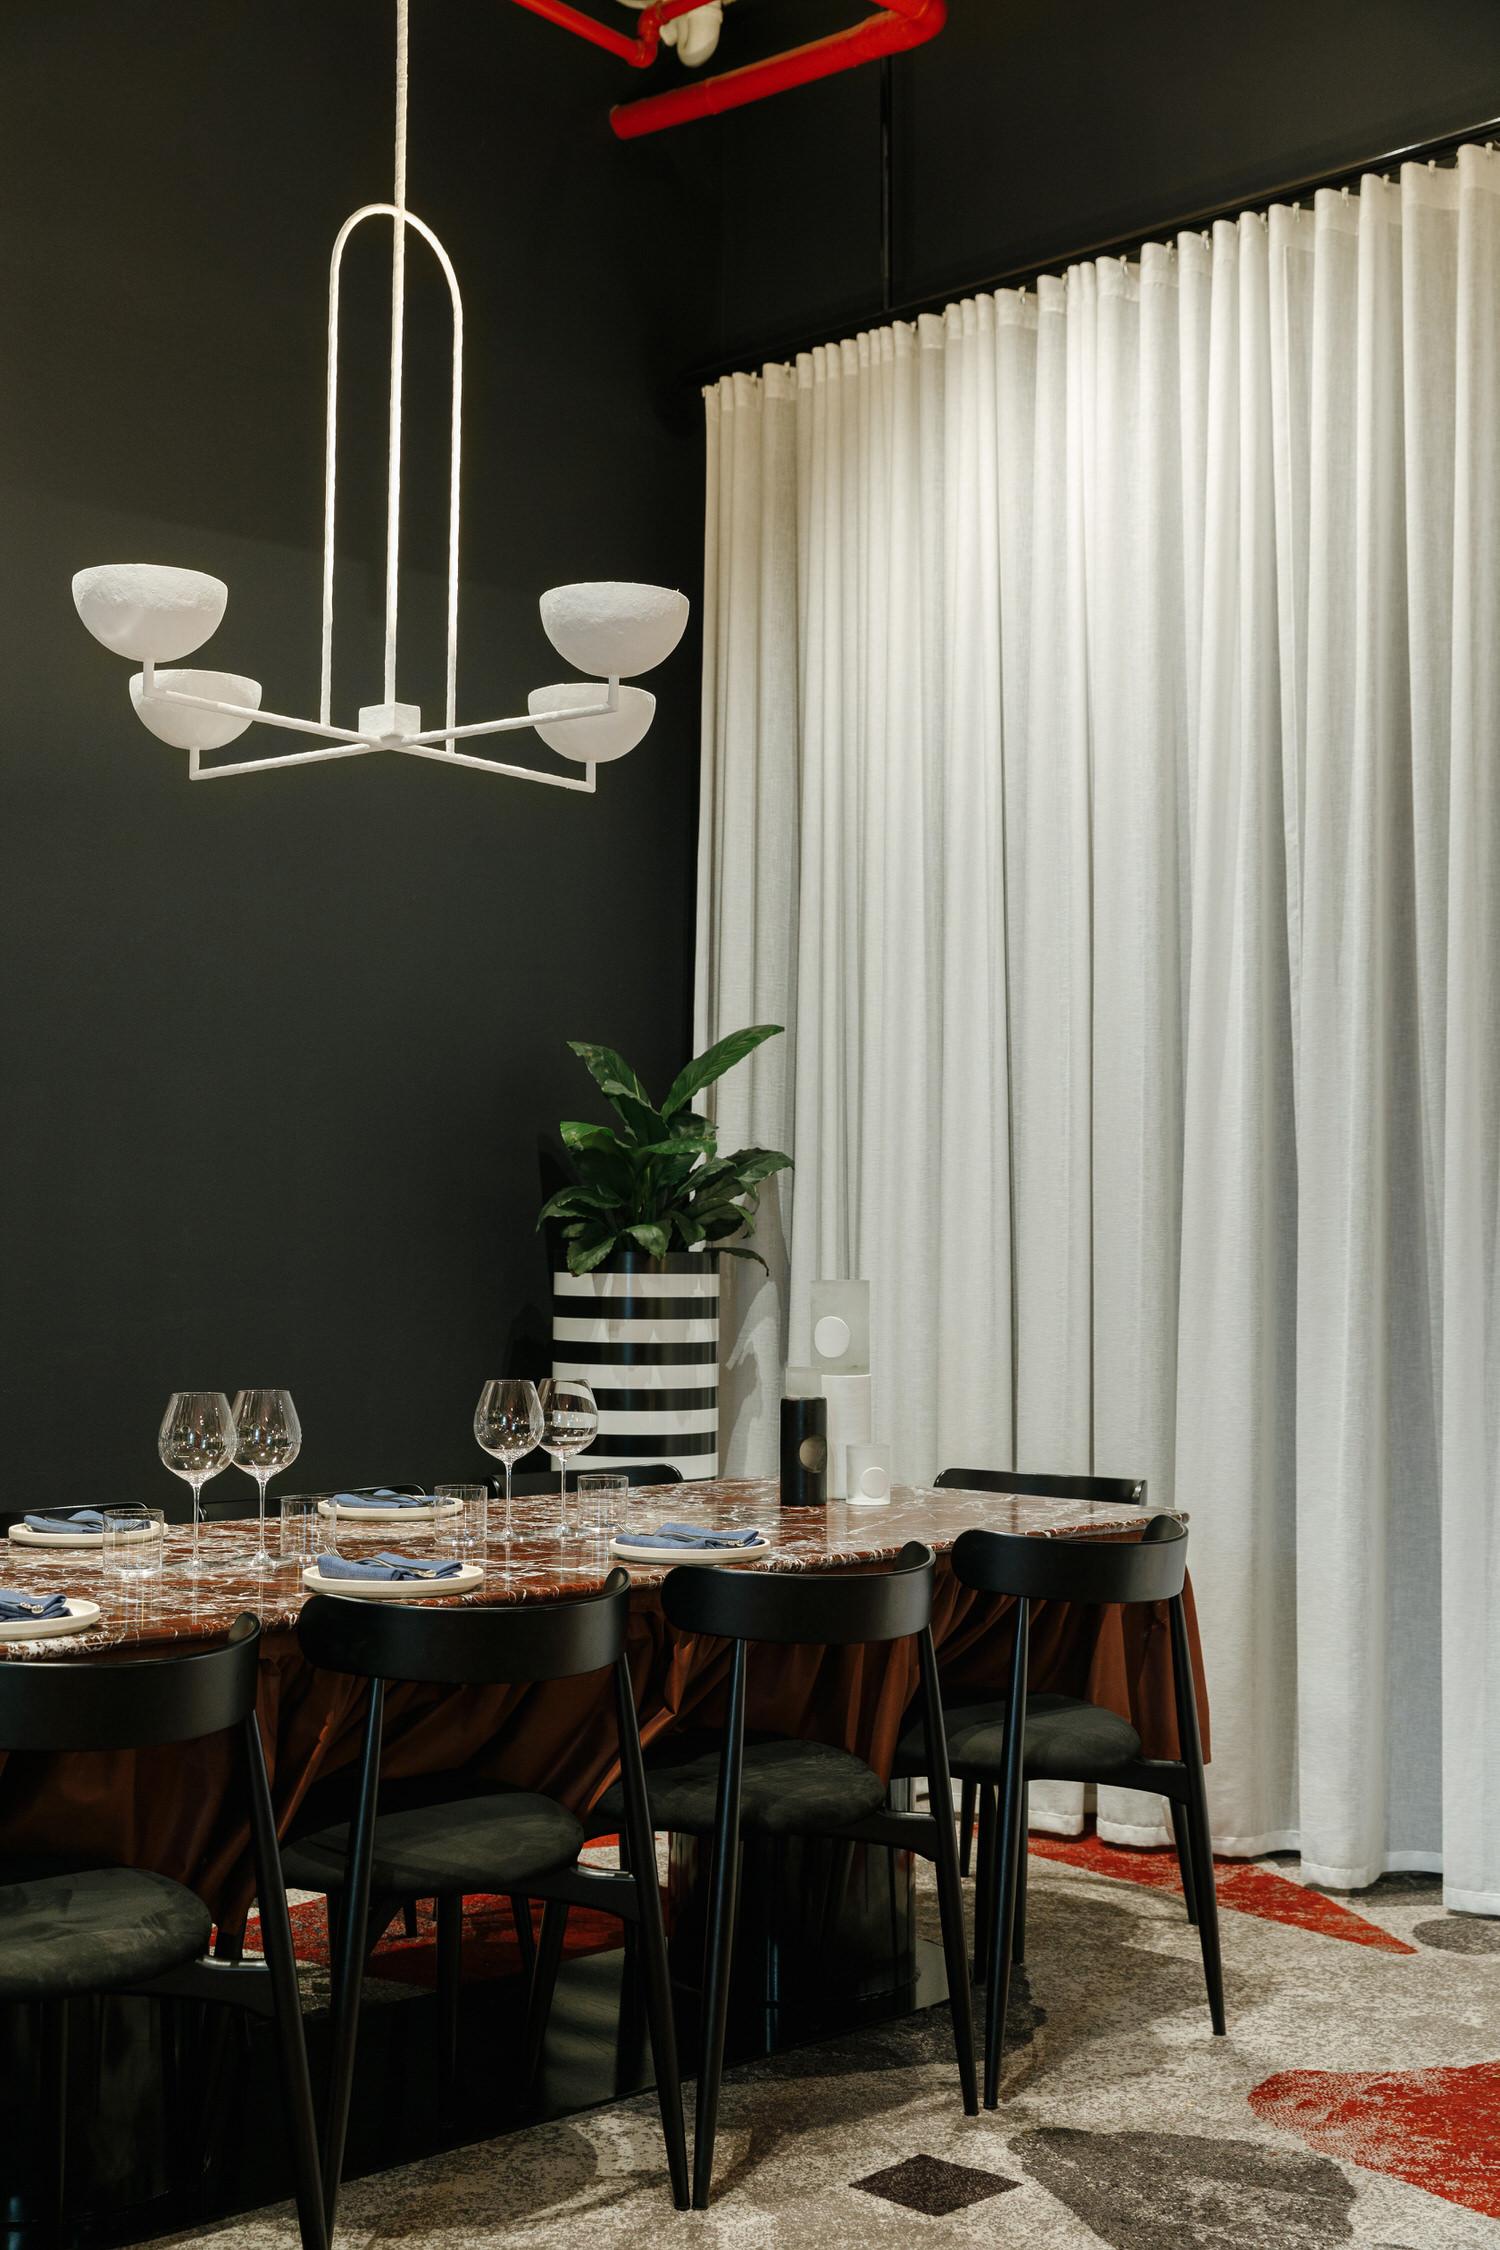 Studio Gram Fugazzi Adelaide Restaurant Bar Photo Jonathan Vdk Yellowtrace 13